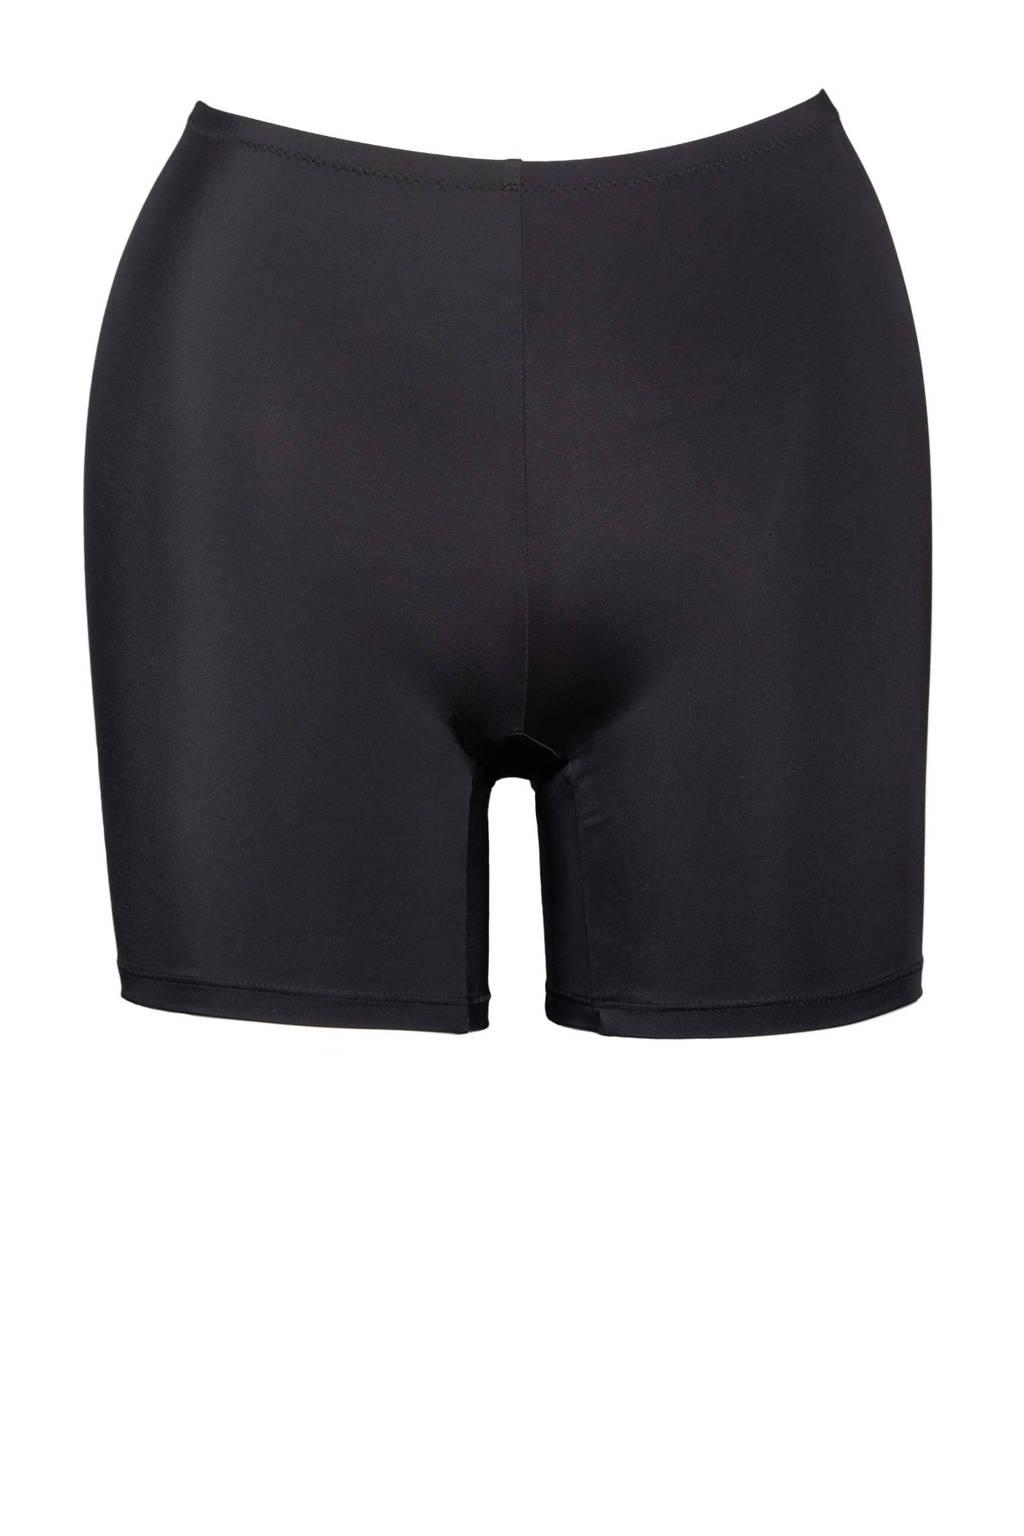 Plaisir +size bikinibroekje met pijpjes zwart, Zwart